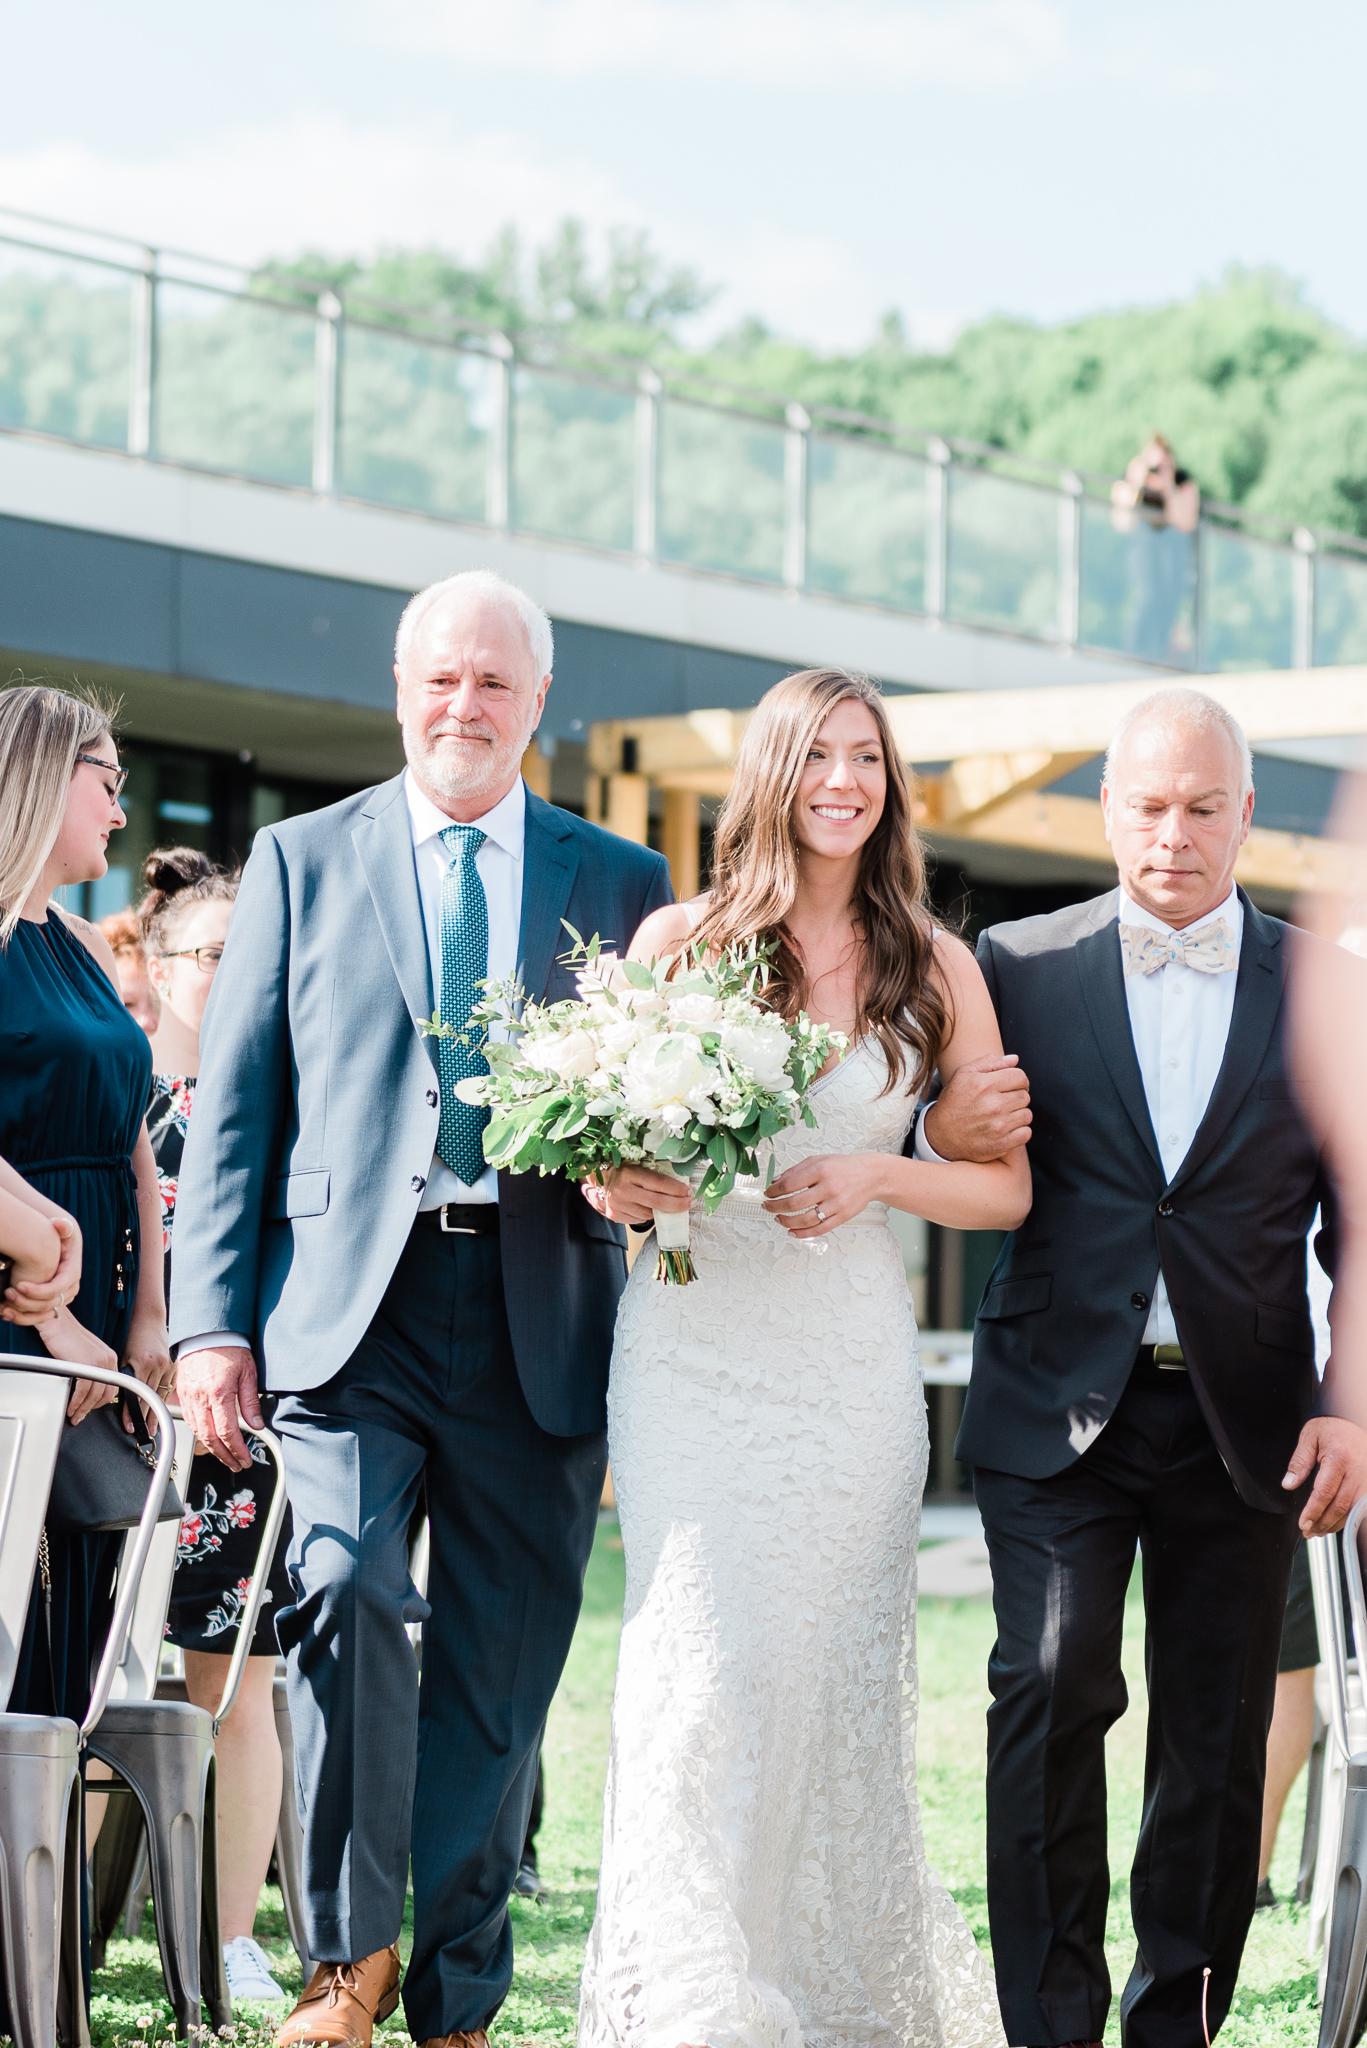 photo mariage salle du quai cap blanc quebec ceremonie toscane elisa photographe 2734 - MALYE + ANTHONY | Québec, Salle du Quai du Cap Blanc | Photographe de mariage | Elisa Photography